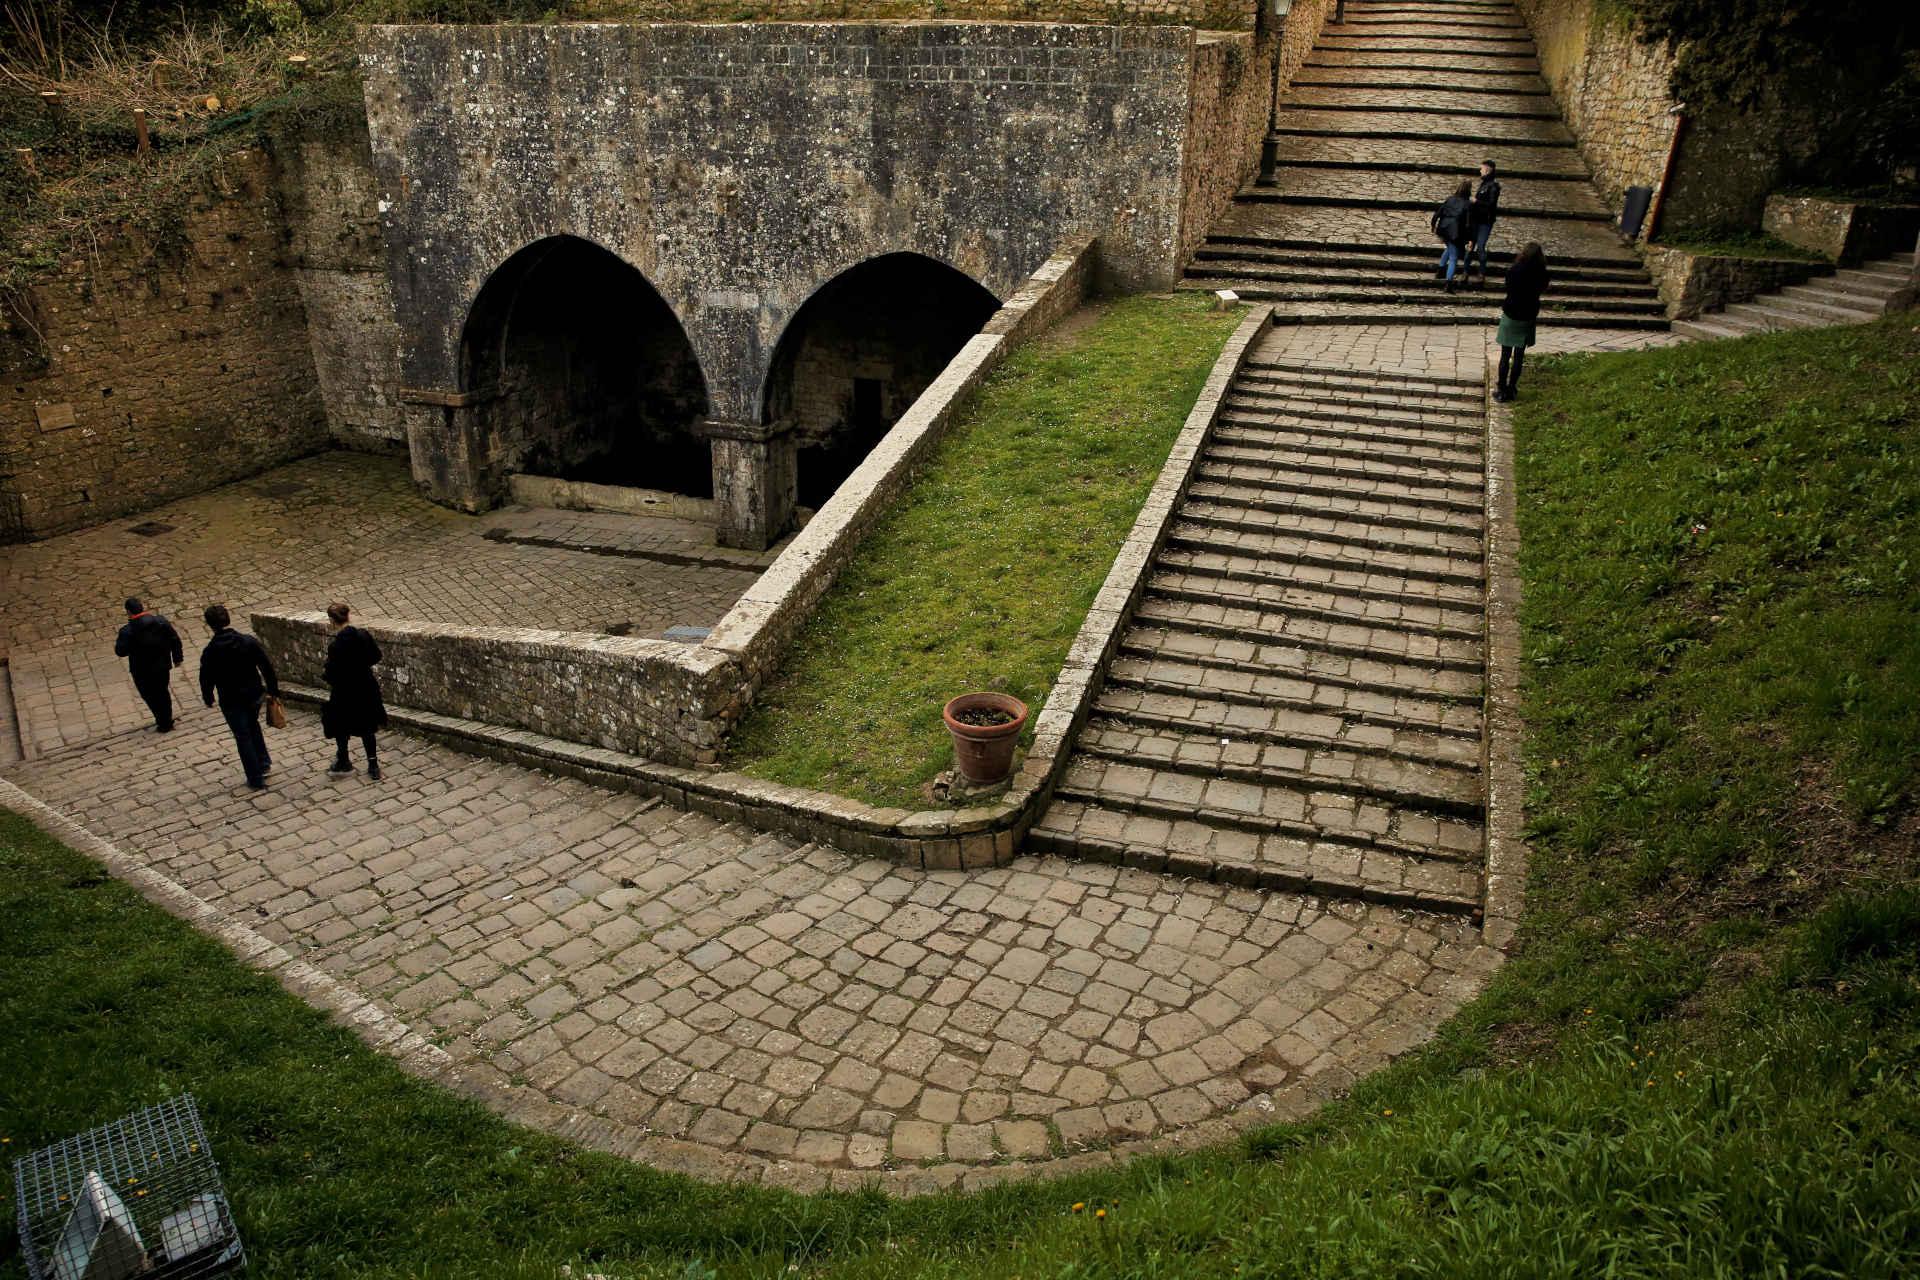 trekking-urbano-volterra-e-dintorni-fonti-medievali